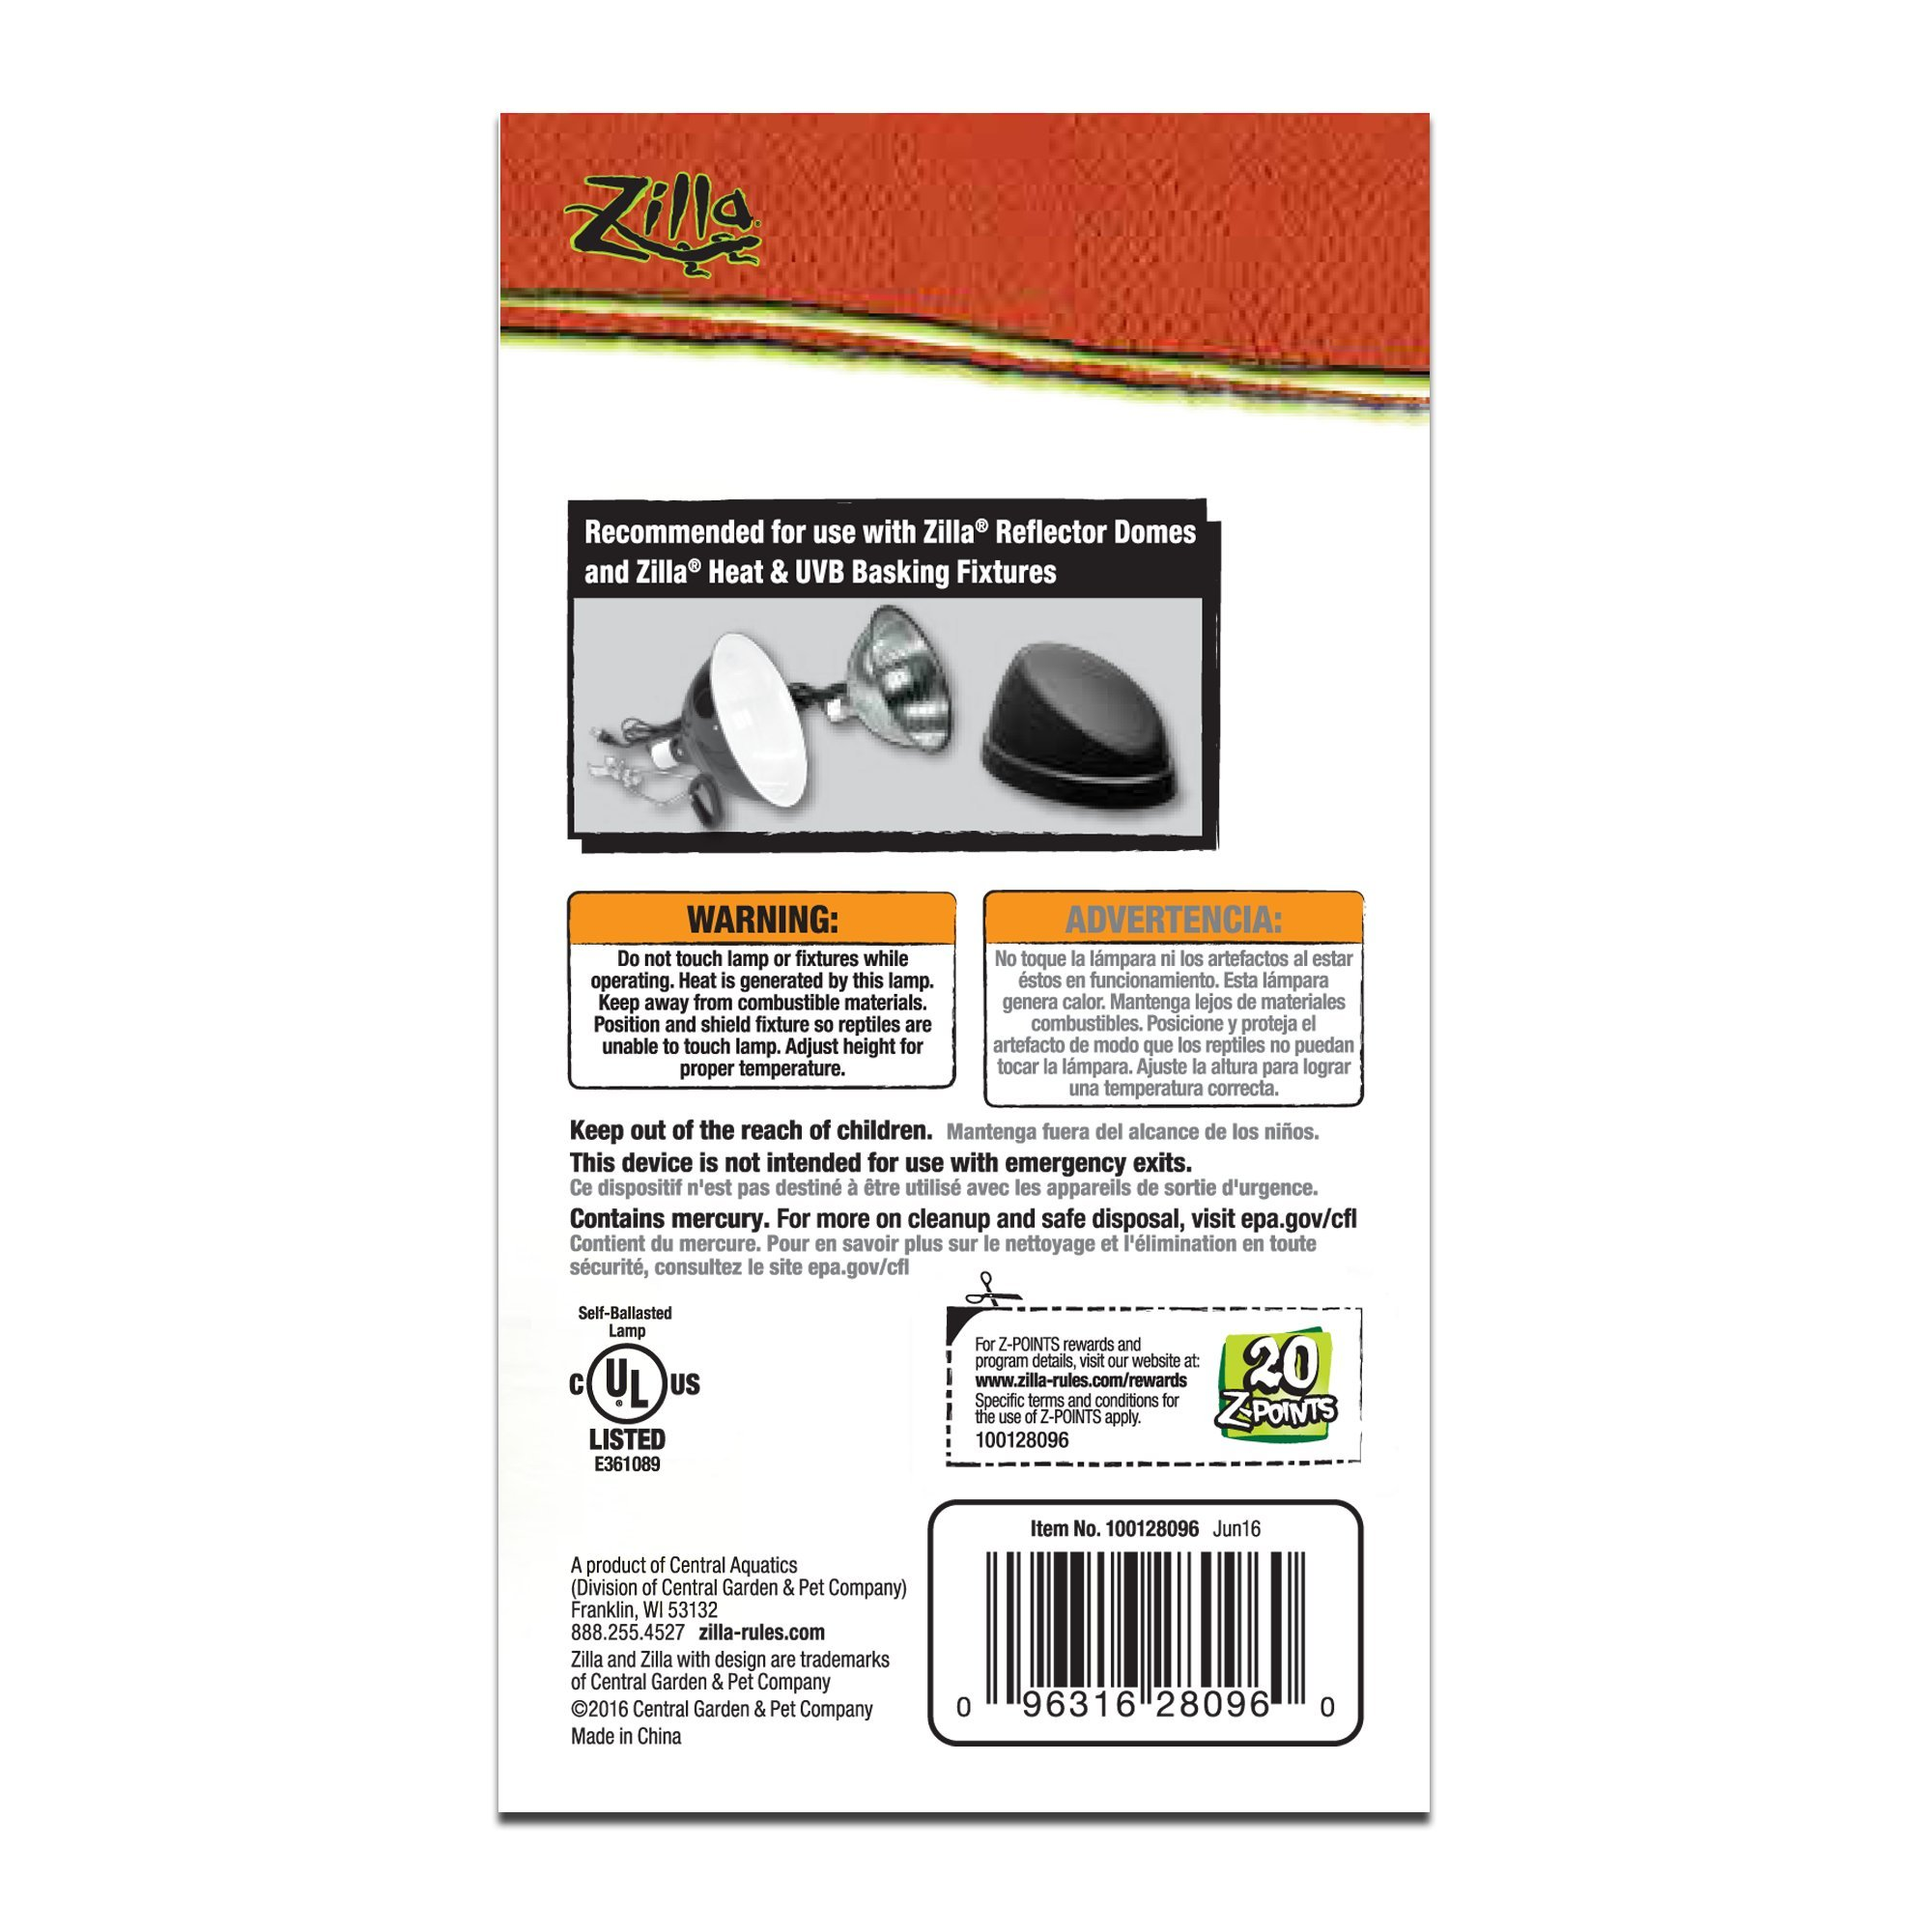 Zilla Desert Fluorescent UVB/UVA Bulb, 20 Watt, 3.875 IN by Zilla (Image #2)